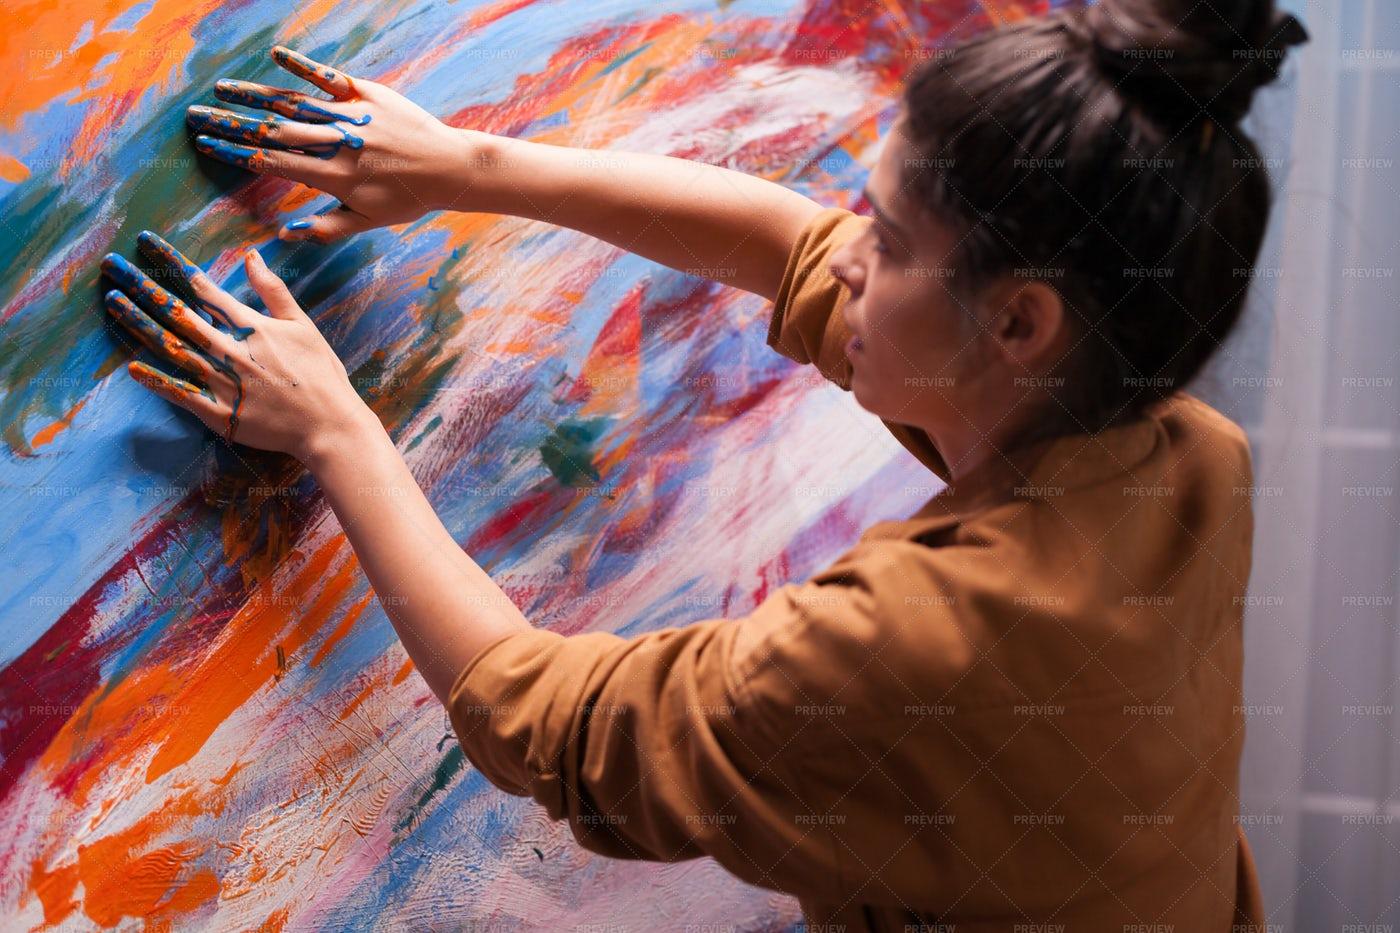 Creativity With Fingers: Stock Photos